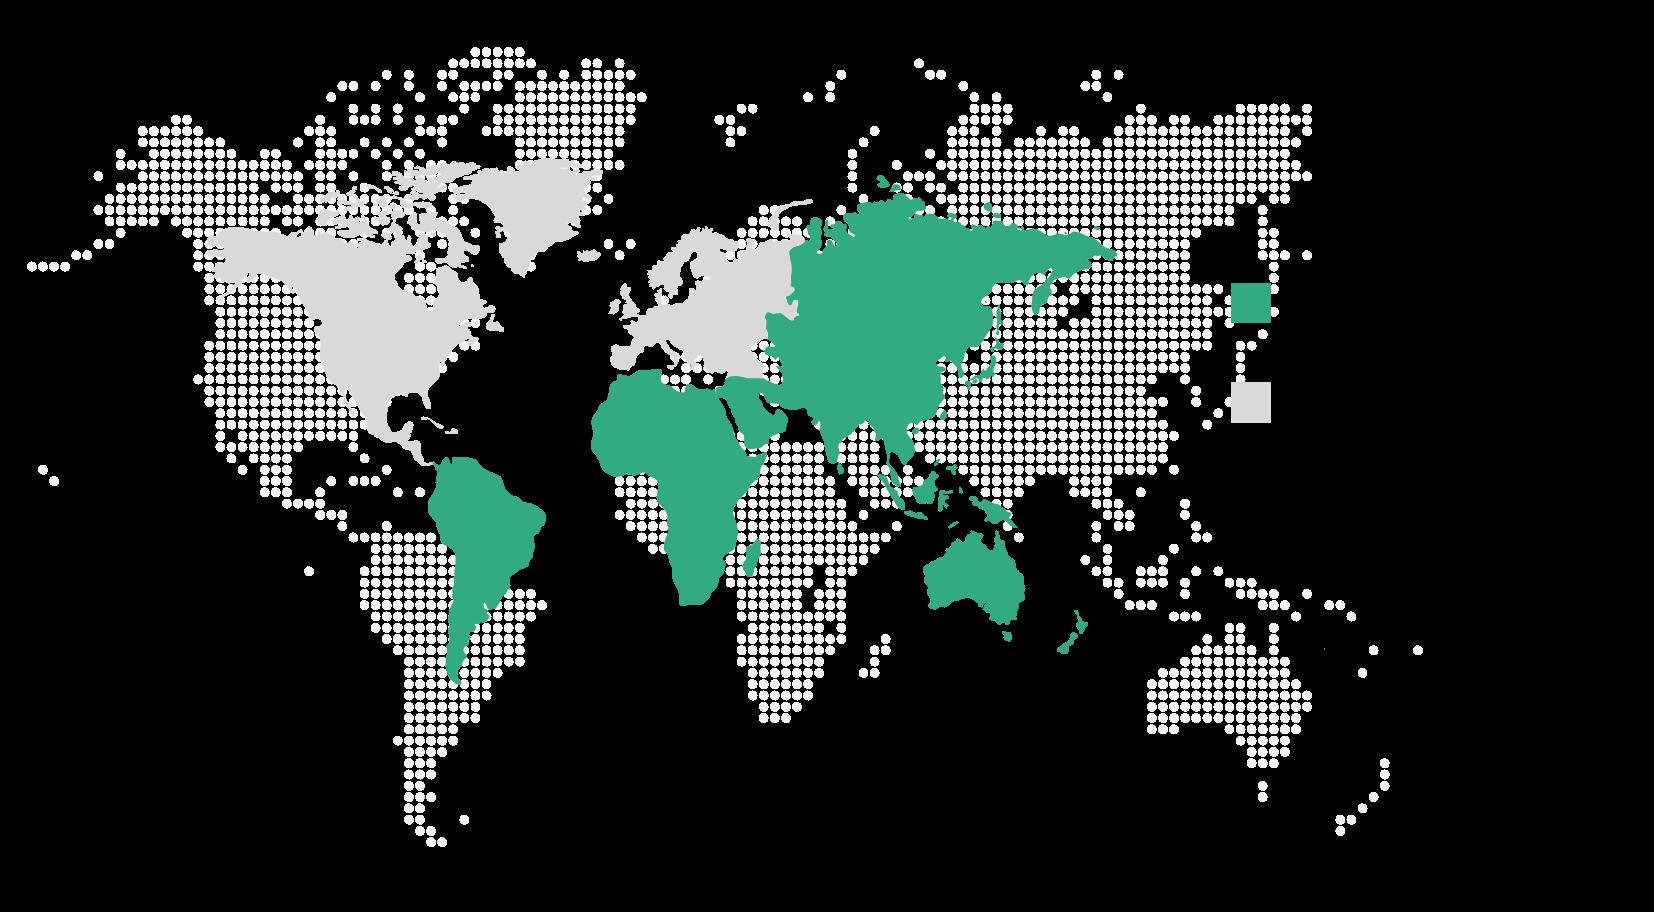 rings-market-share-by-region